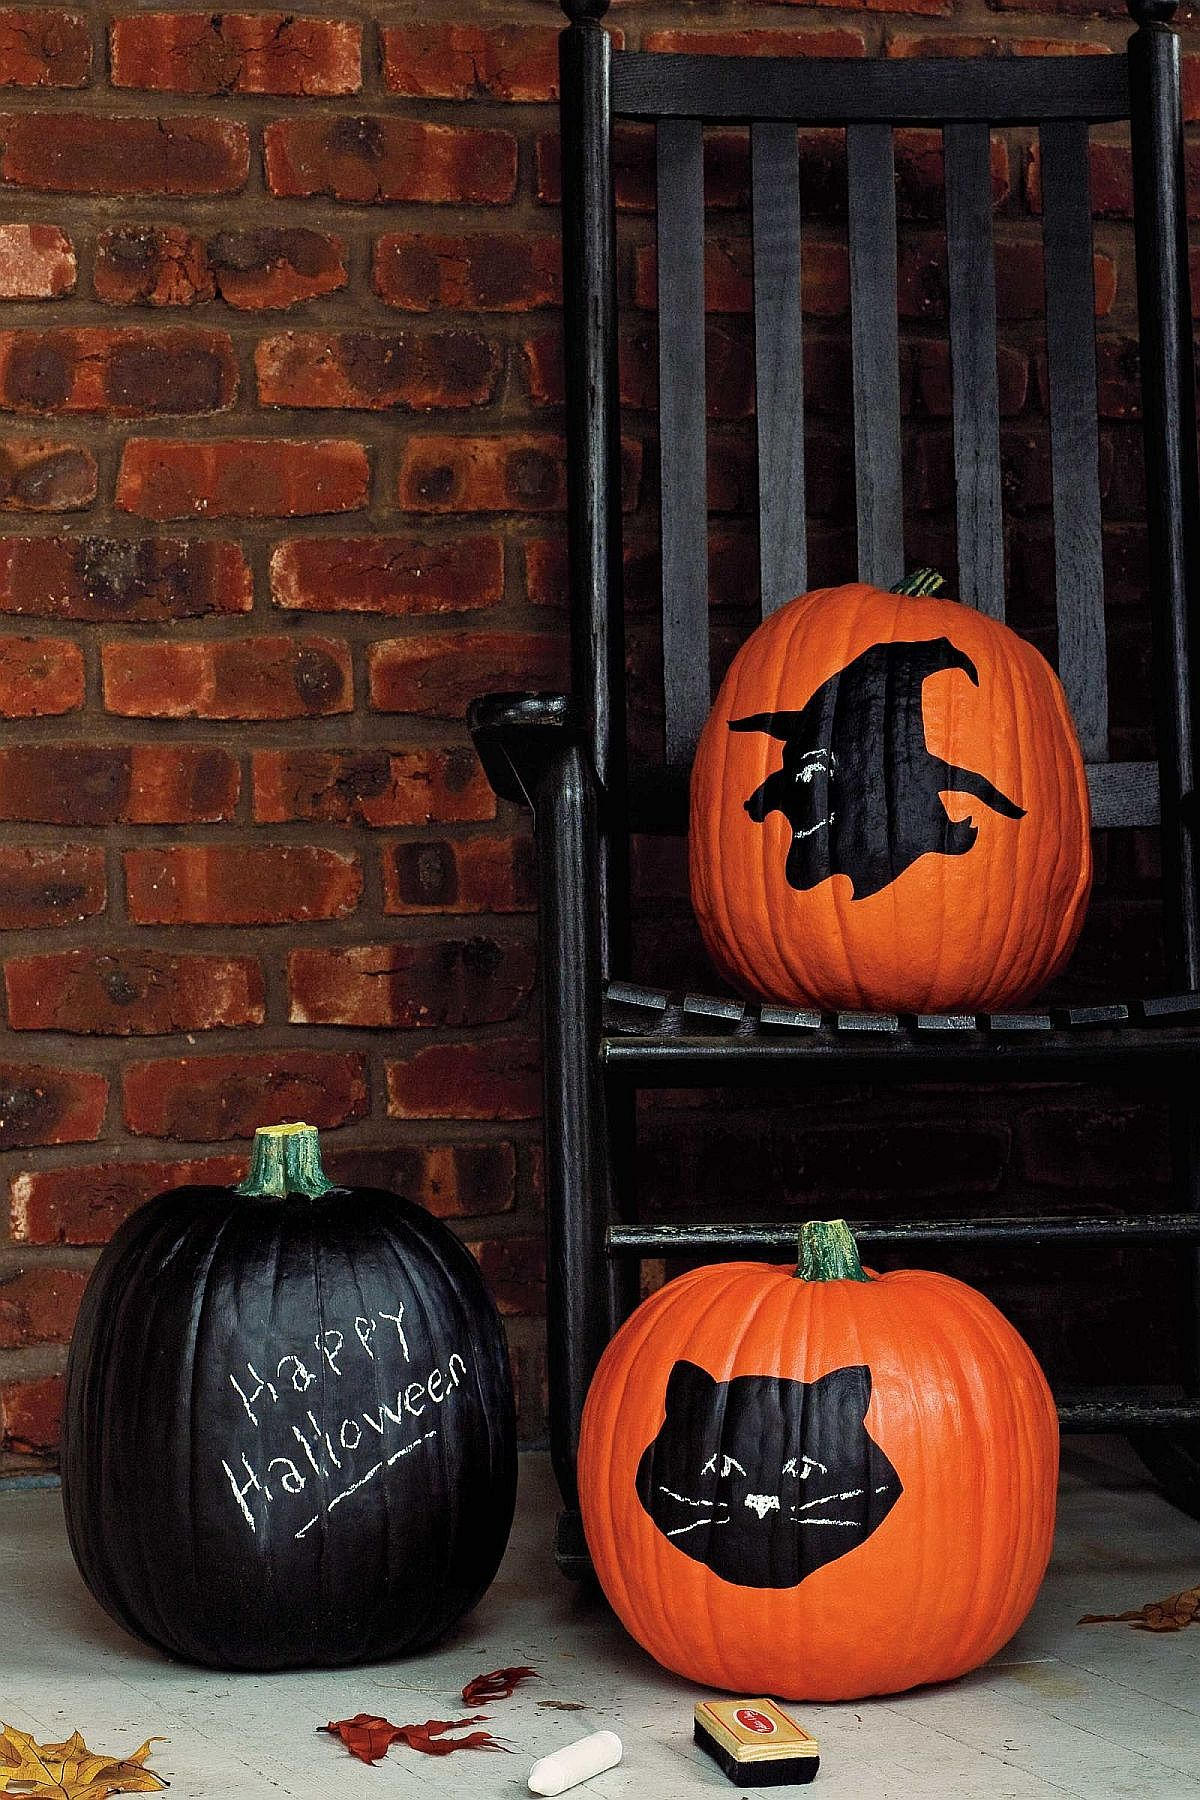 Easy painted pumpkin idea for Halloween